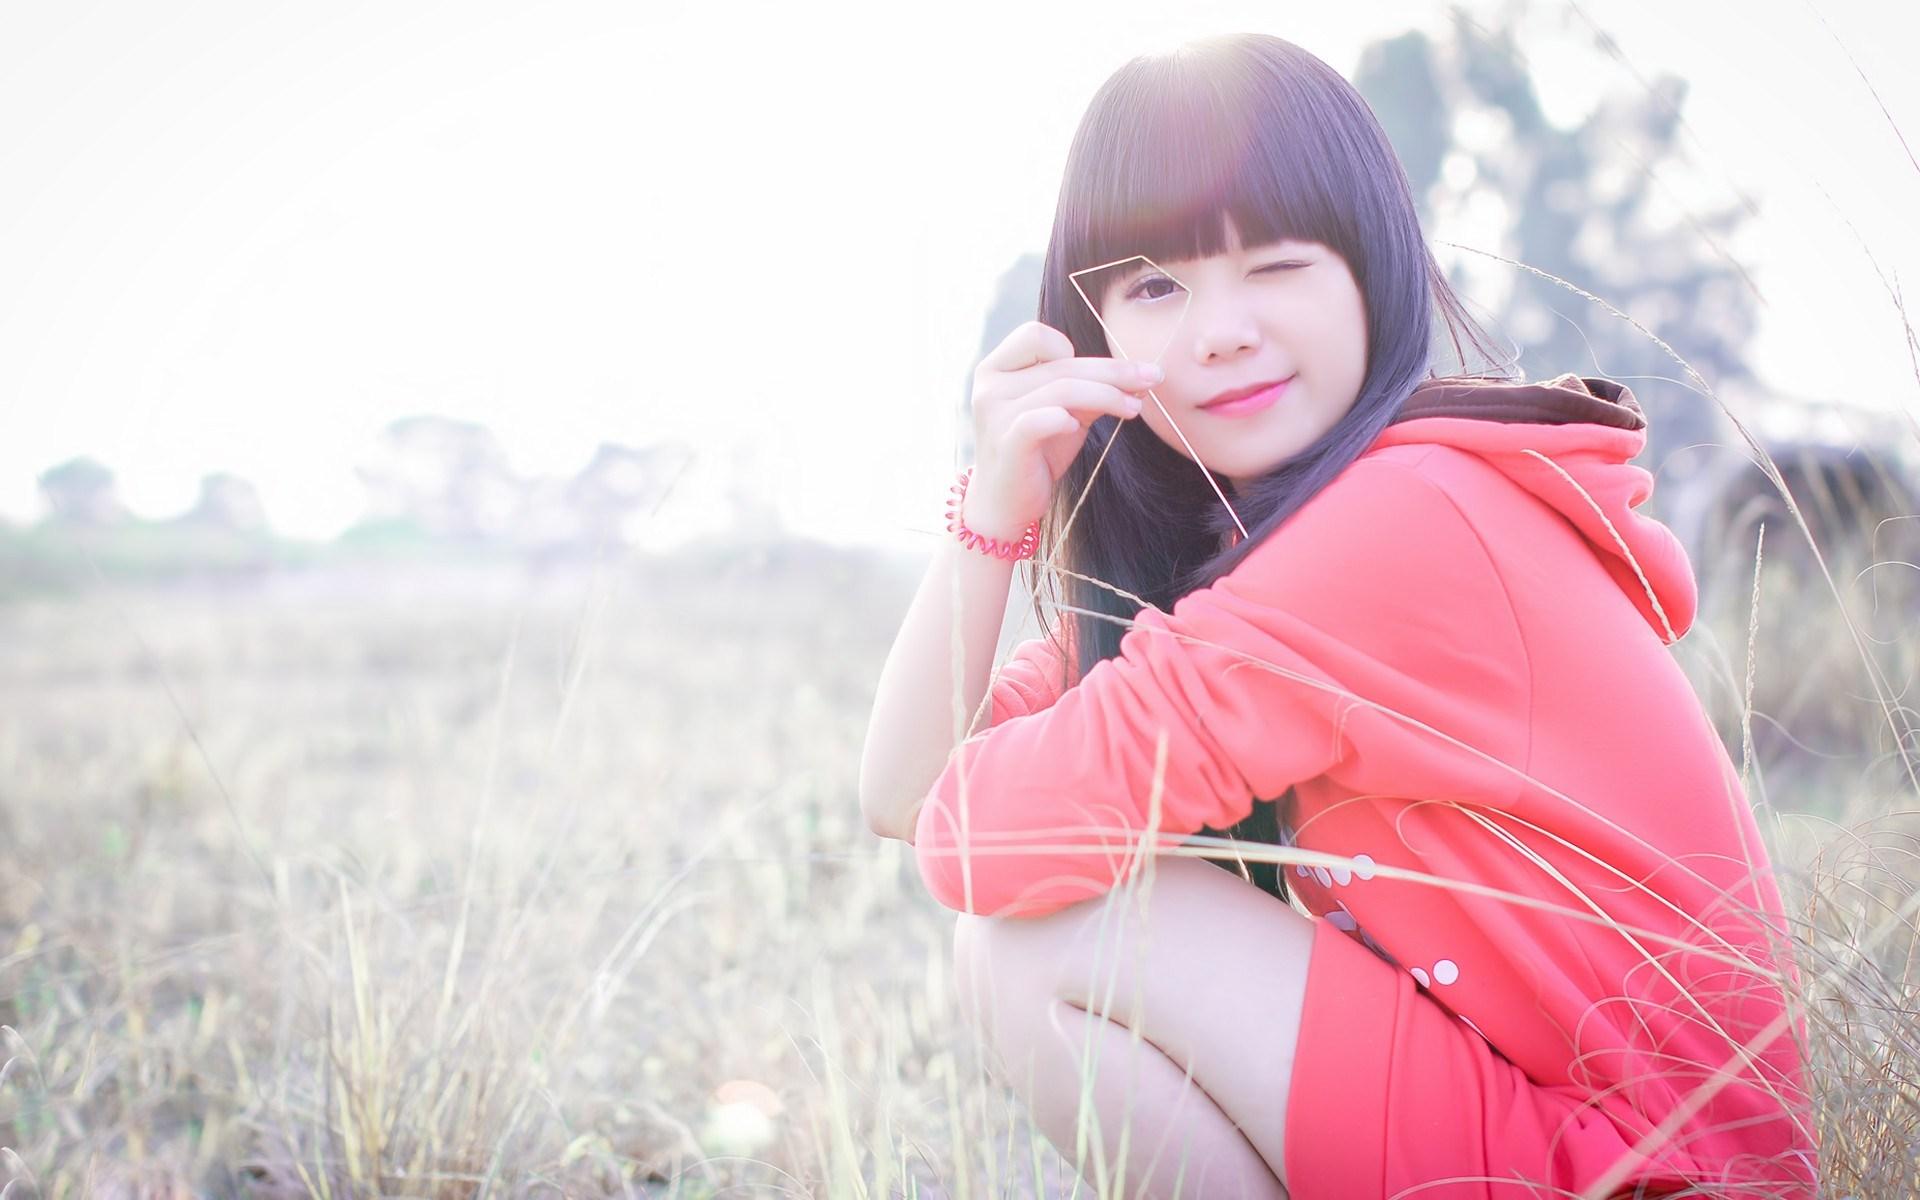 Brunette Asian Girl Photography HD Wallpaper